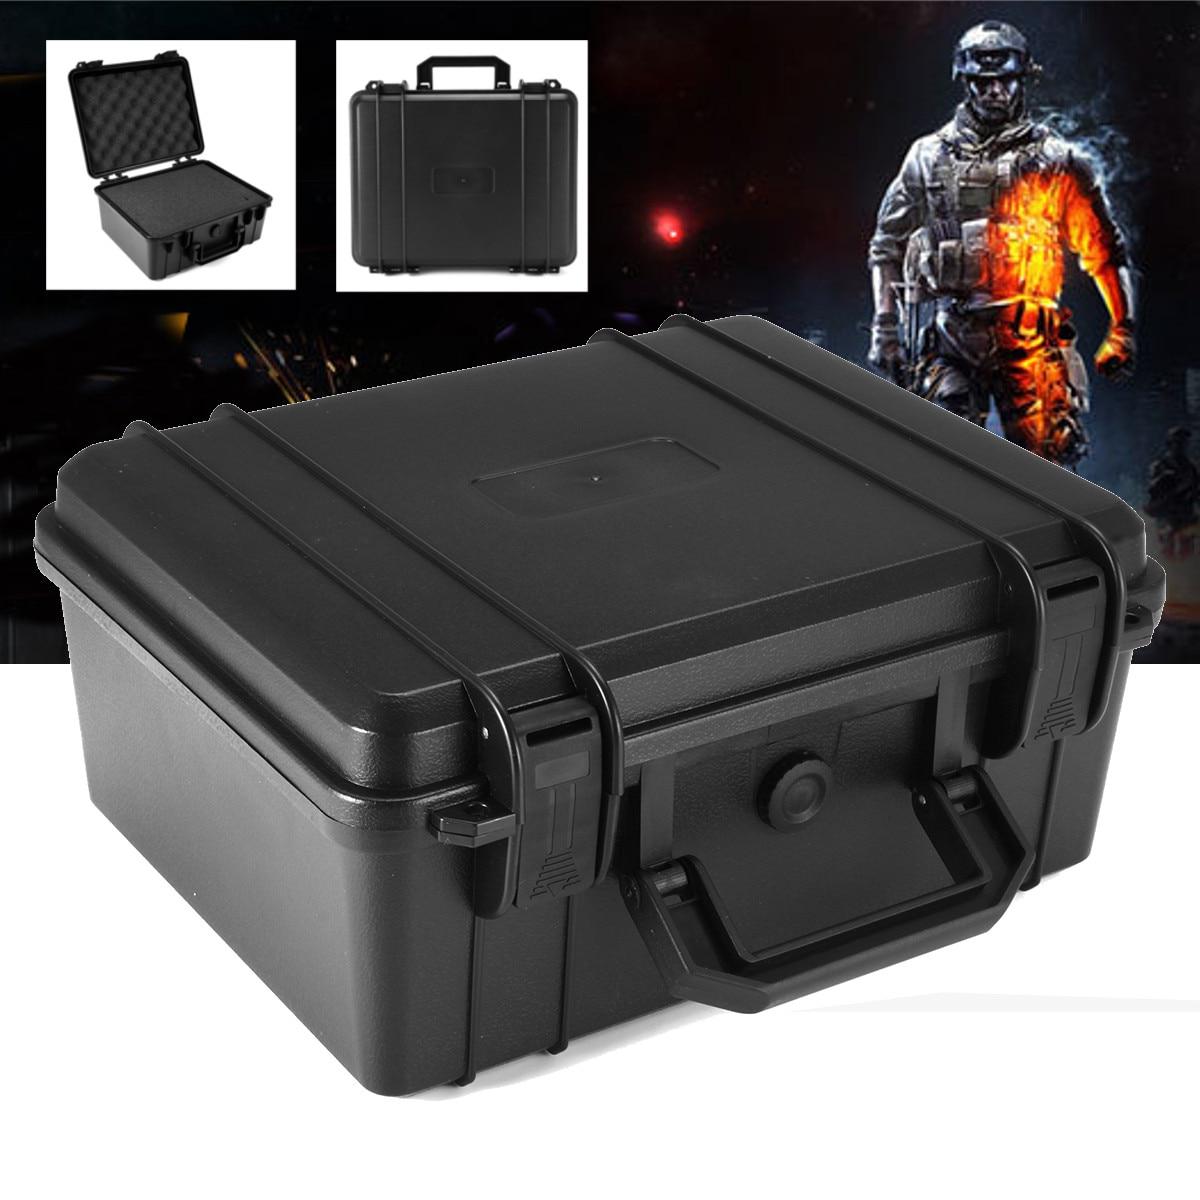 Hardware Toolbox Bag-Tool-Kits Storage-Box Safety-Protector Impact-Resistant Waterproof